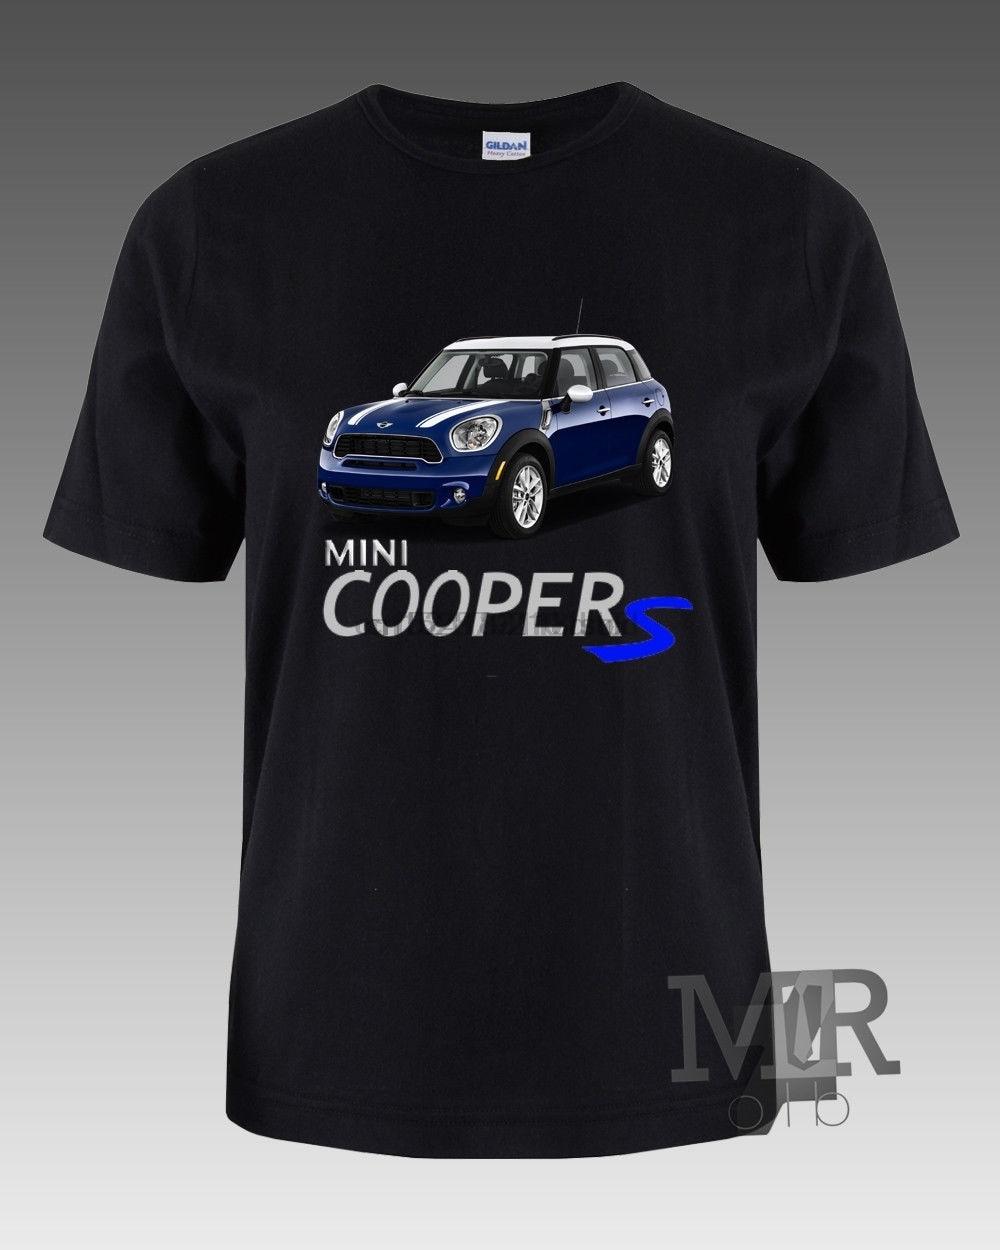 Nuevo Mini Cooper coche azul logotipo camiseta negra M L XL 2XL marca de algodón